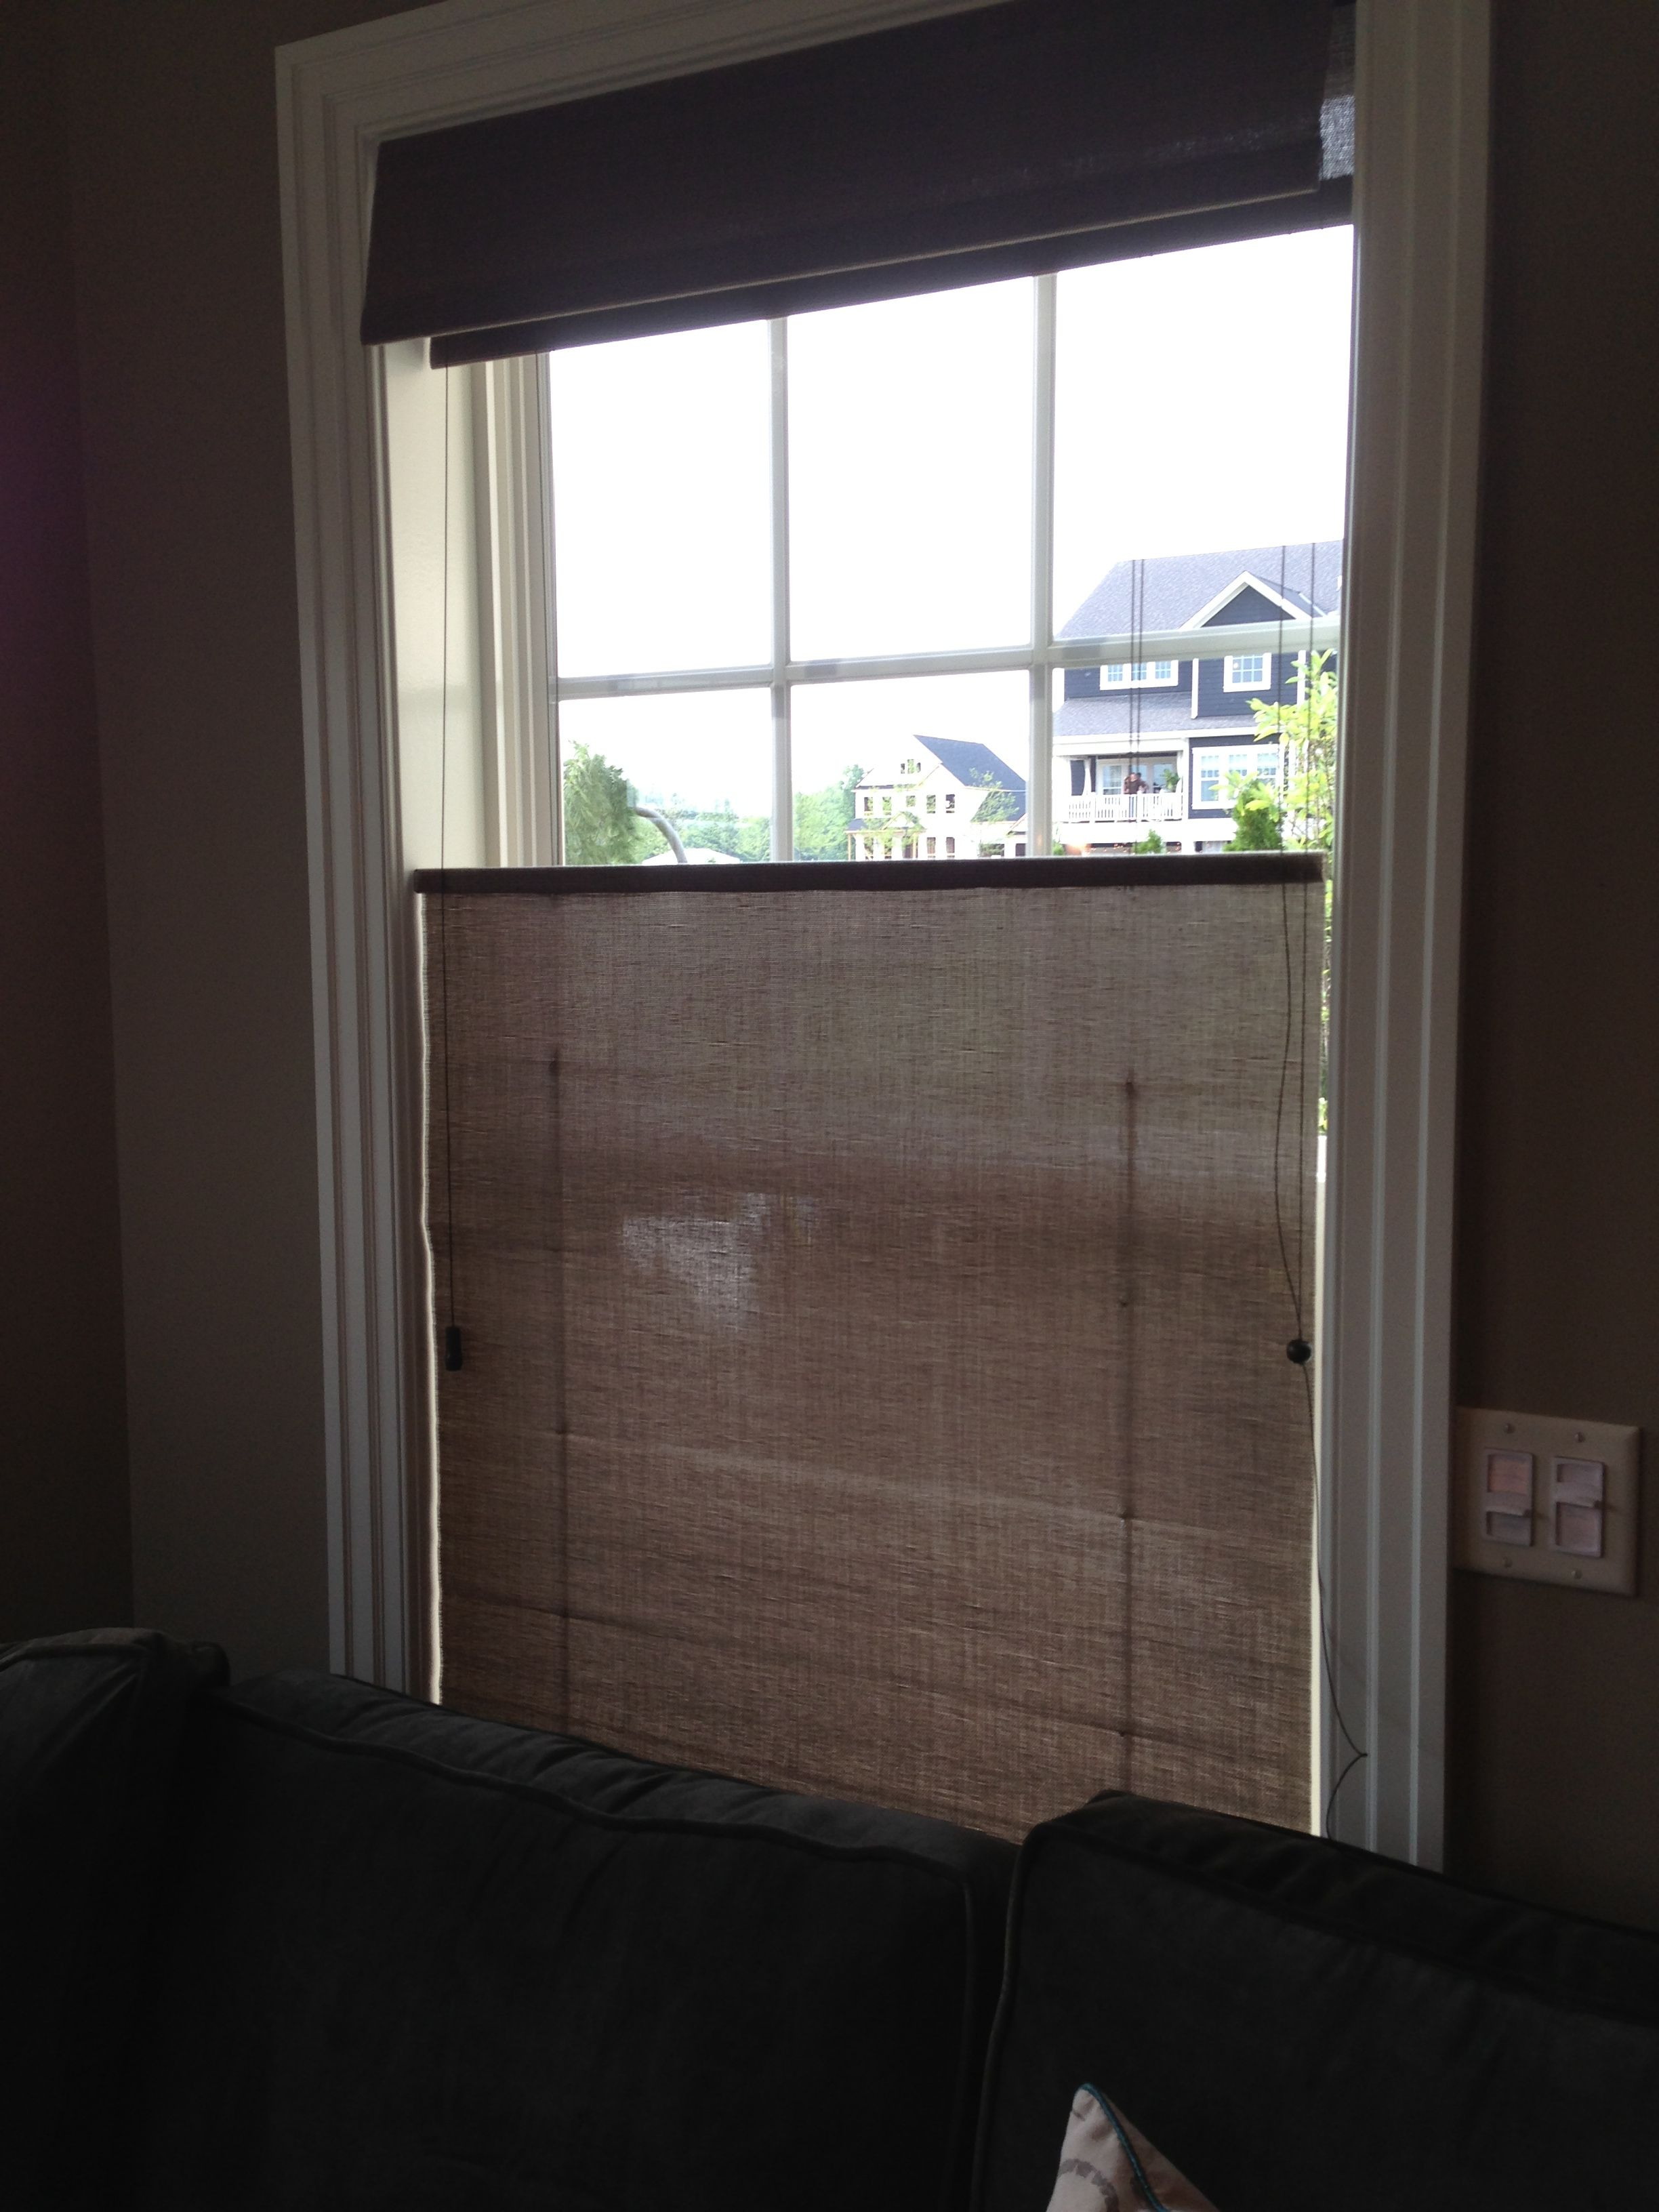 Window decor for bedroom  window treatments  home decor  pinterest  window window